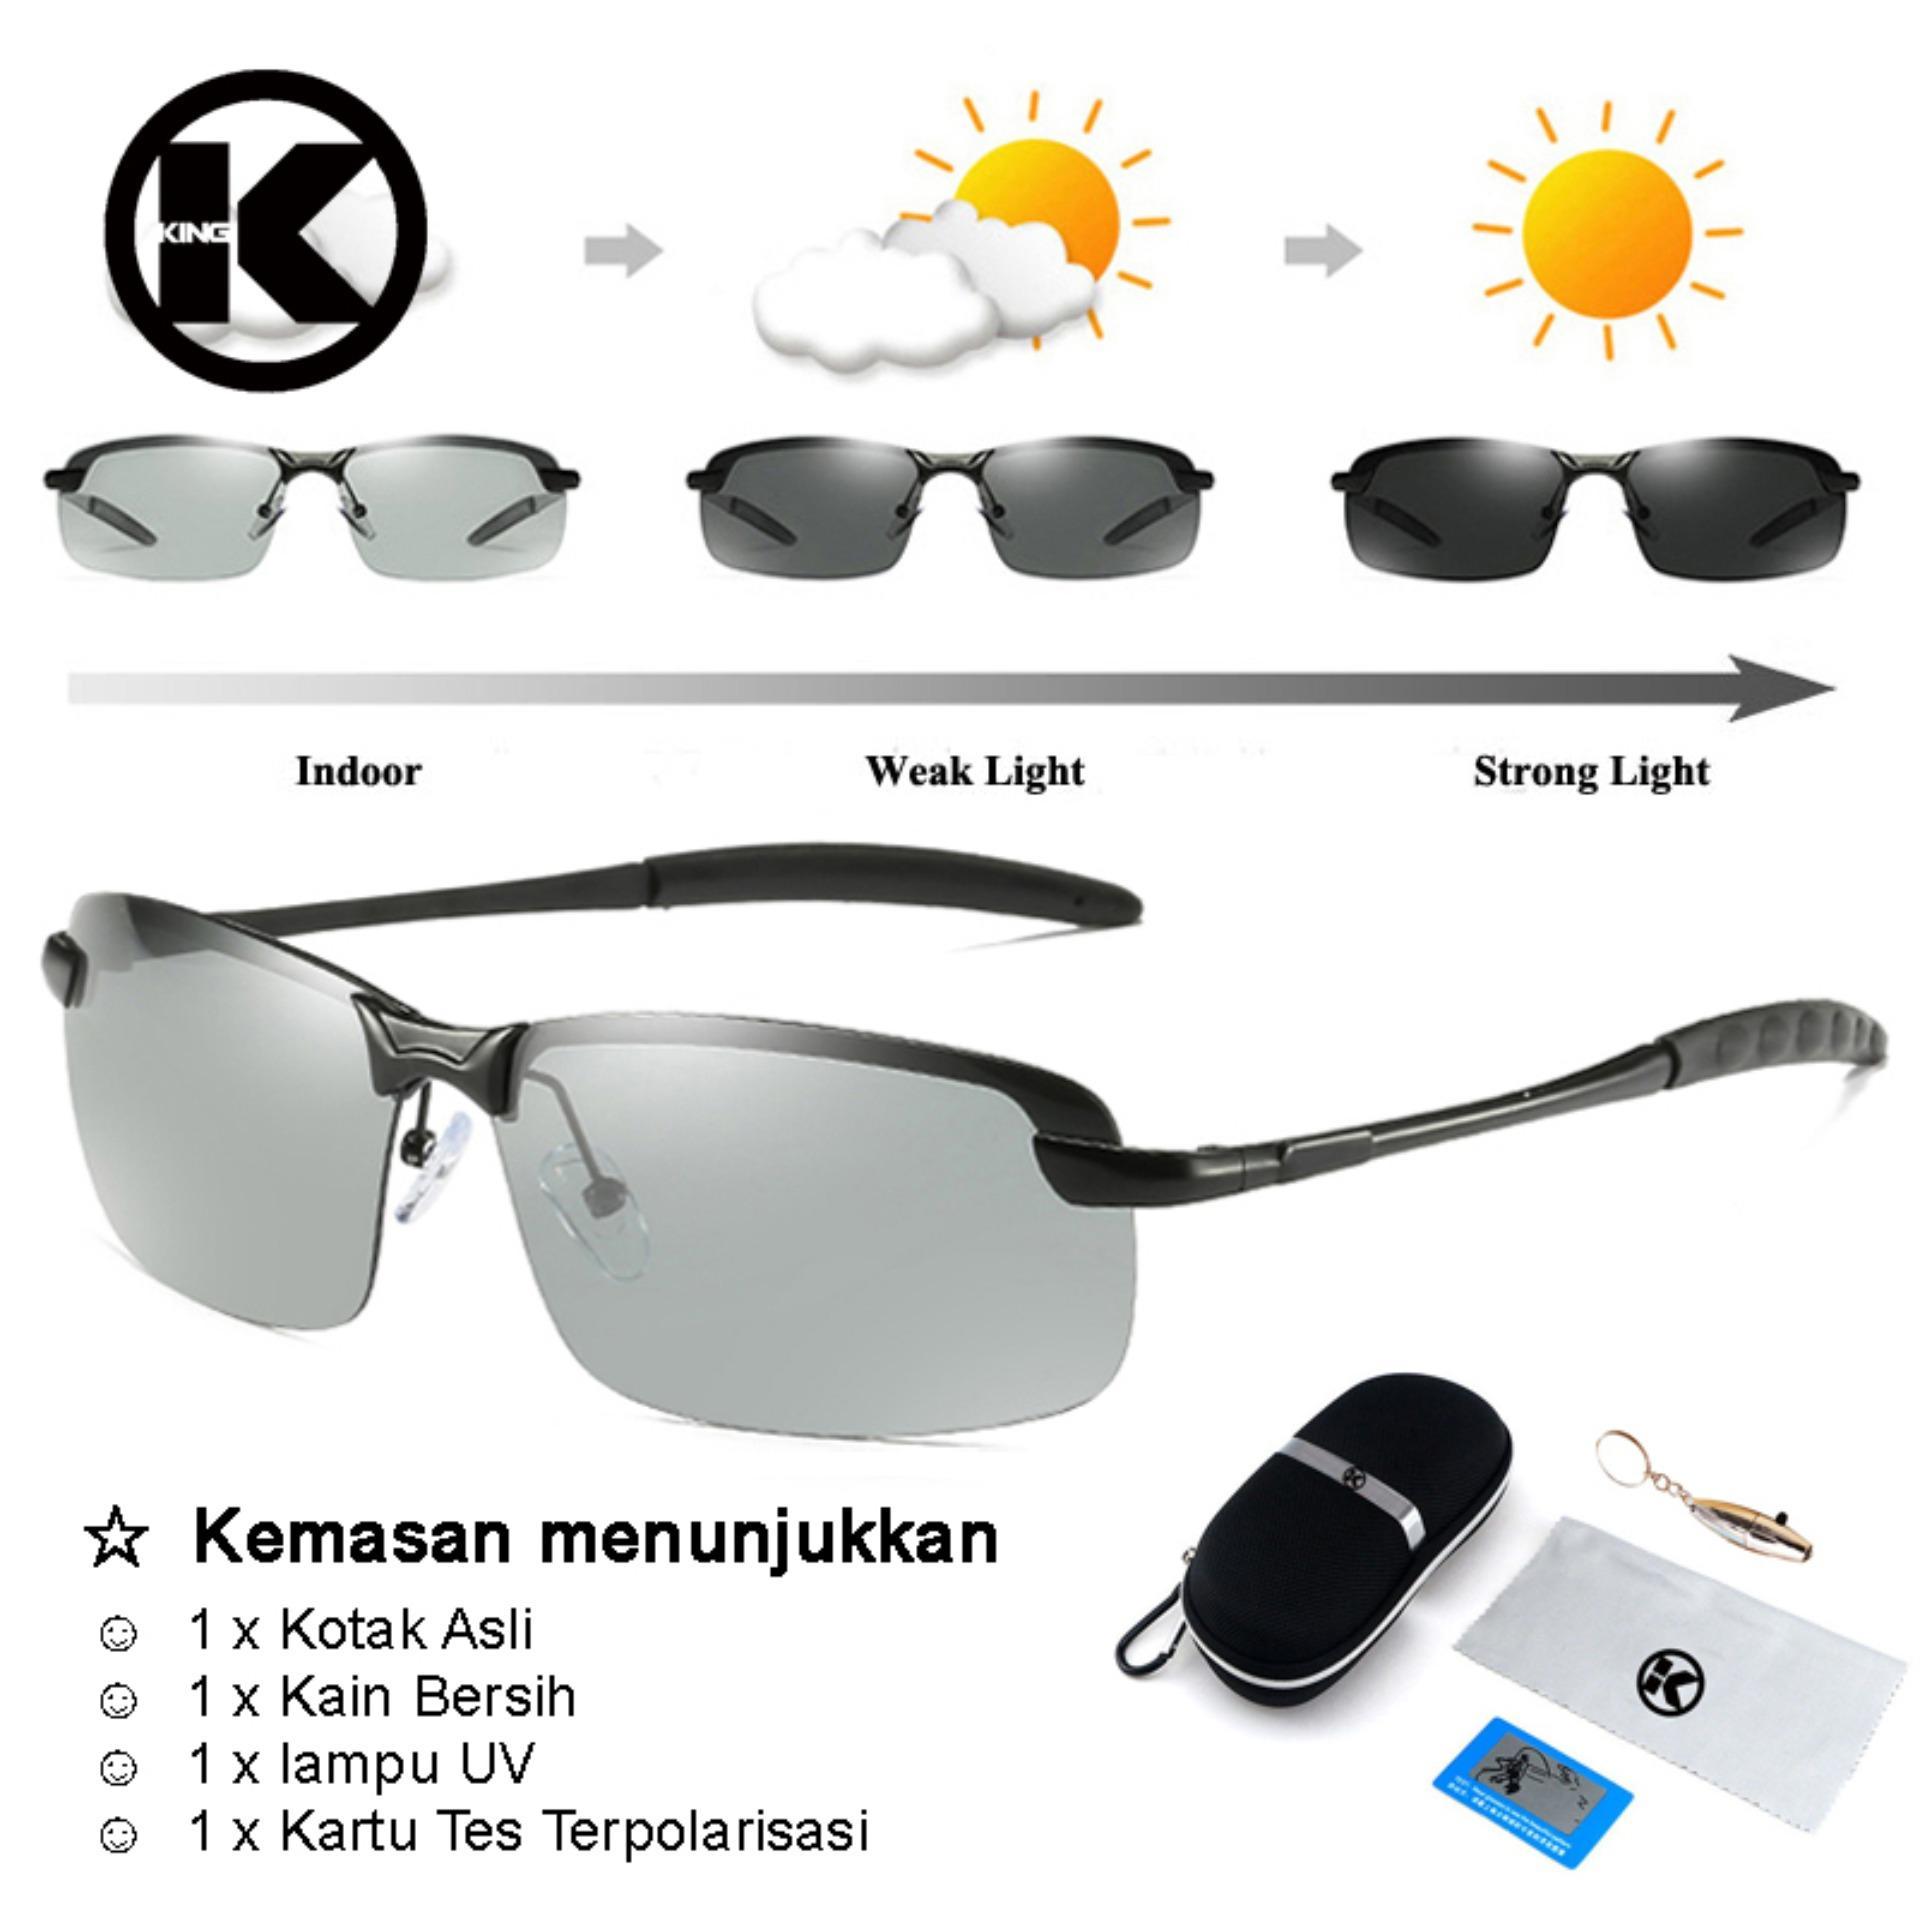 Pria Kacamata Fotokromik Pria Terpolarisasi Perubahan Warna Kacamata HD Pria Anti Silau Kacamata Mengemudi Kacamata Desain